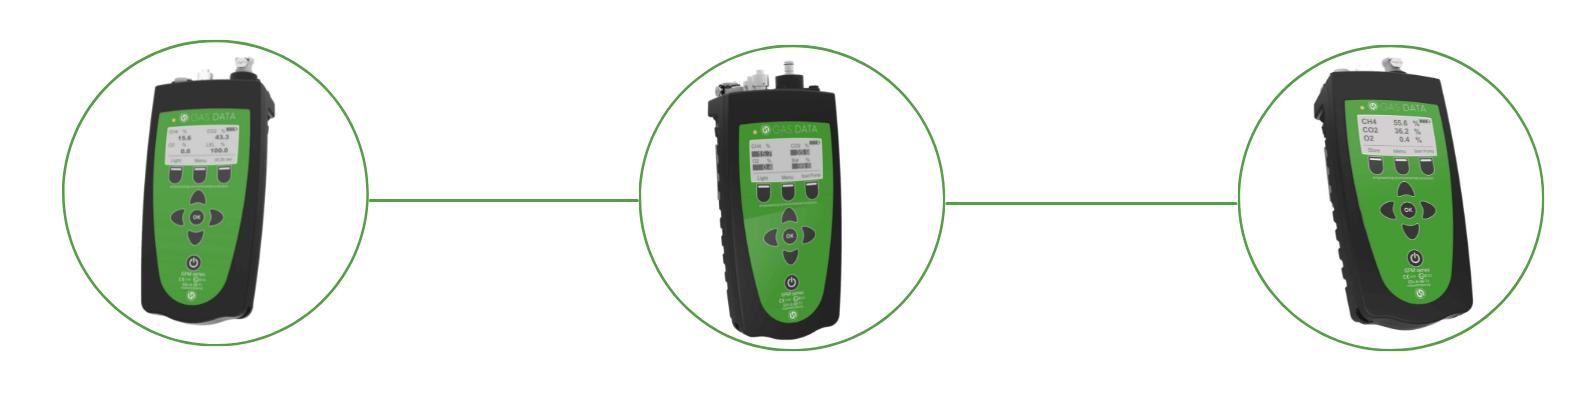 Portable biogas analyzers